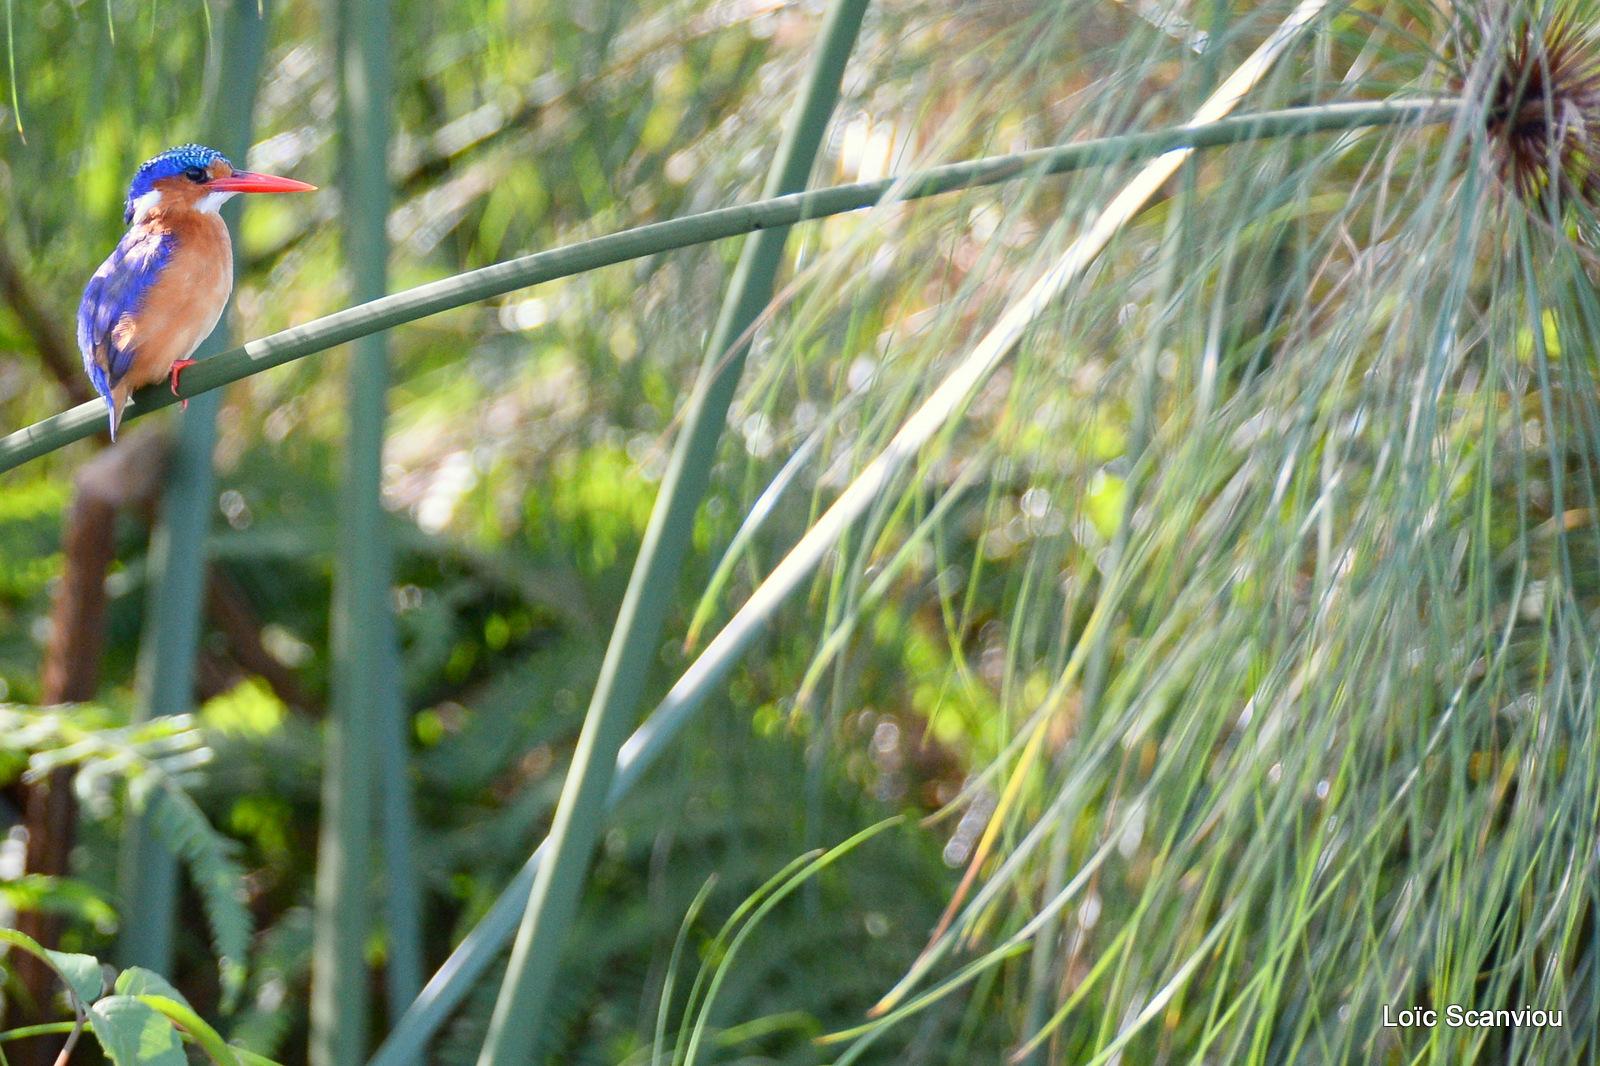 Martin-pêcheur huppé/Malachite Kingfisher (4)